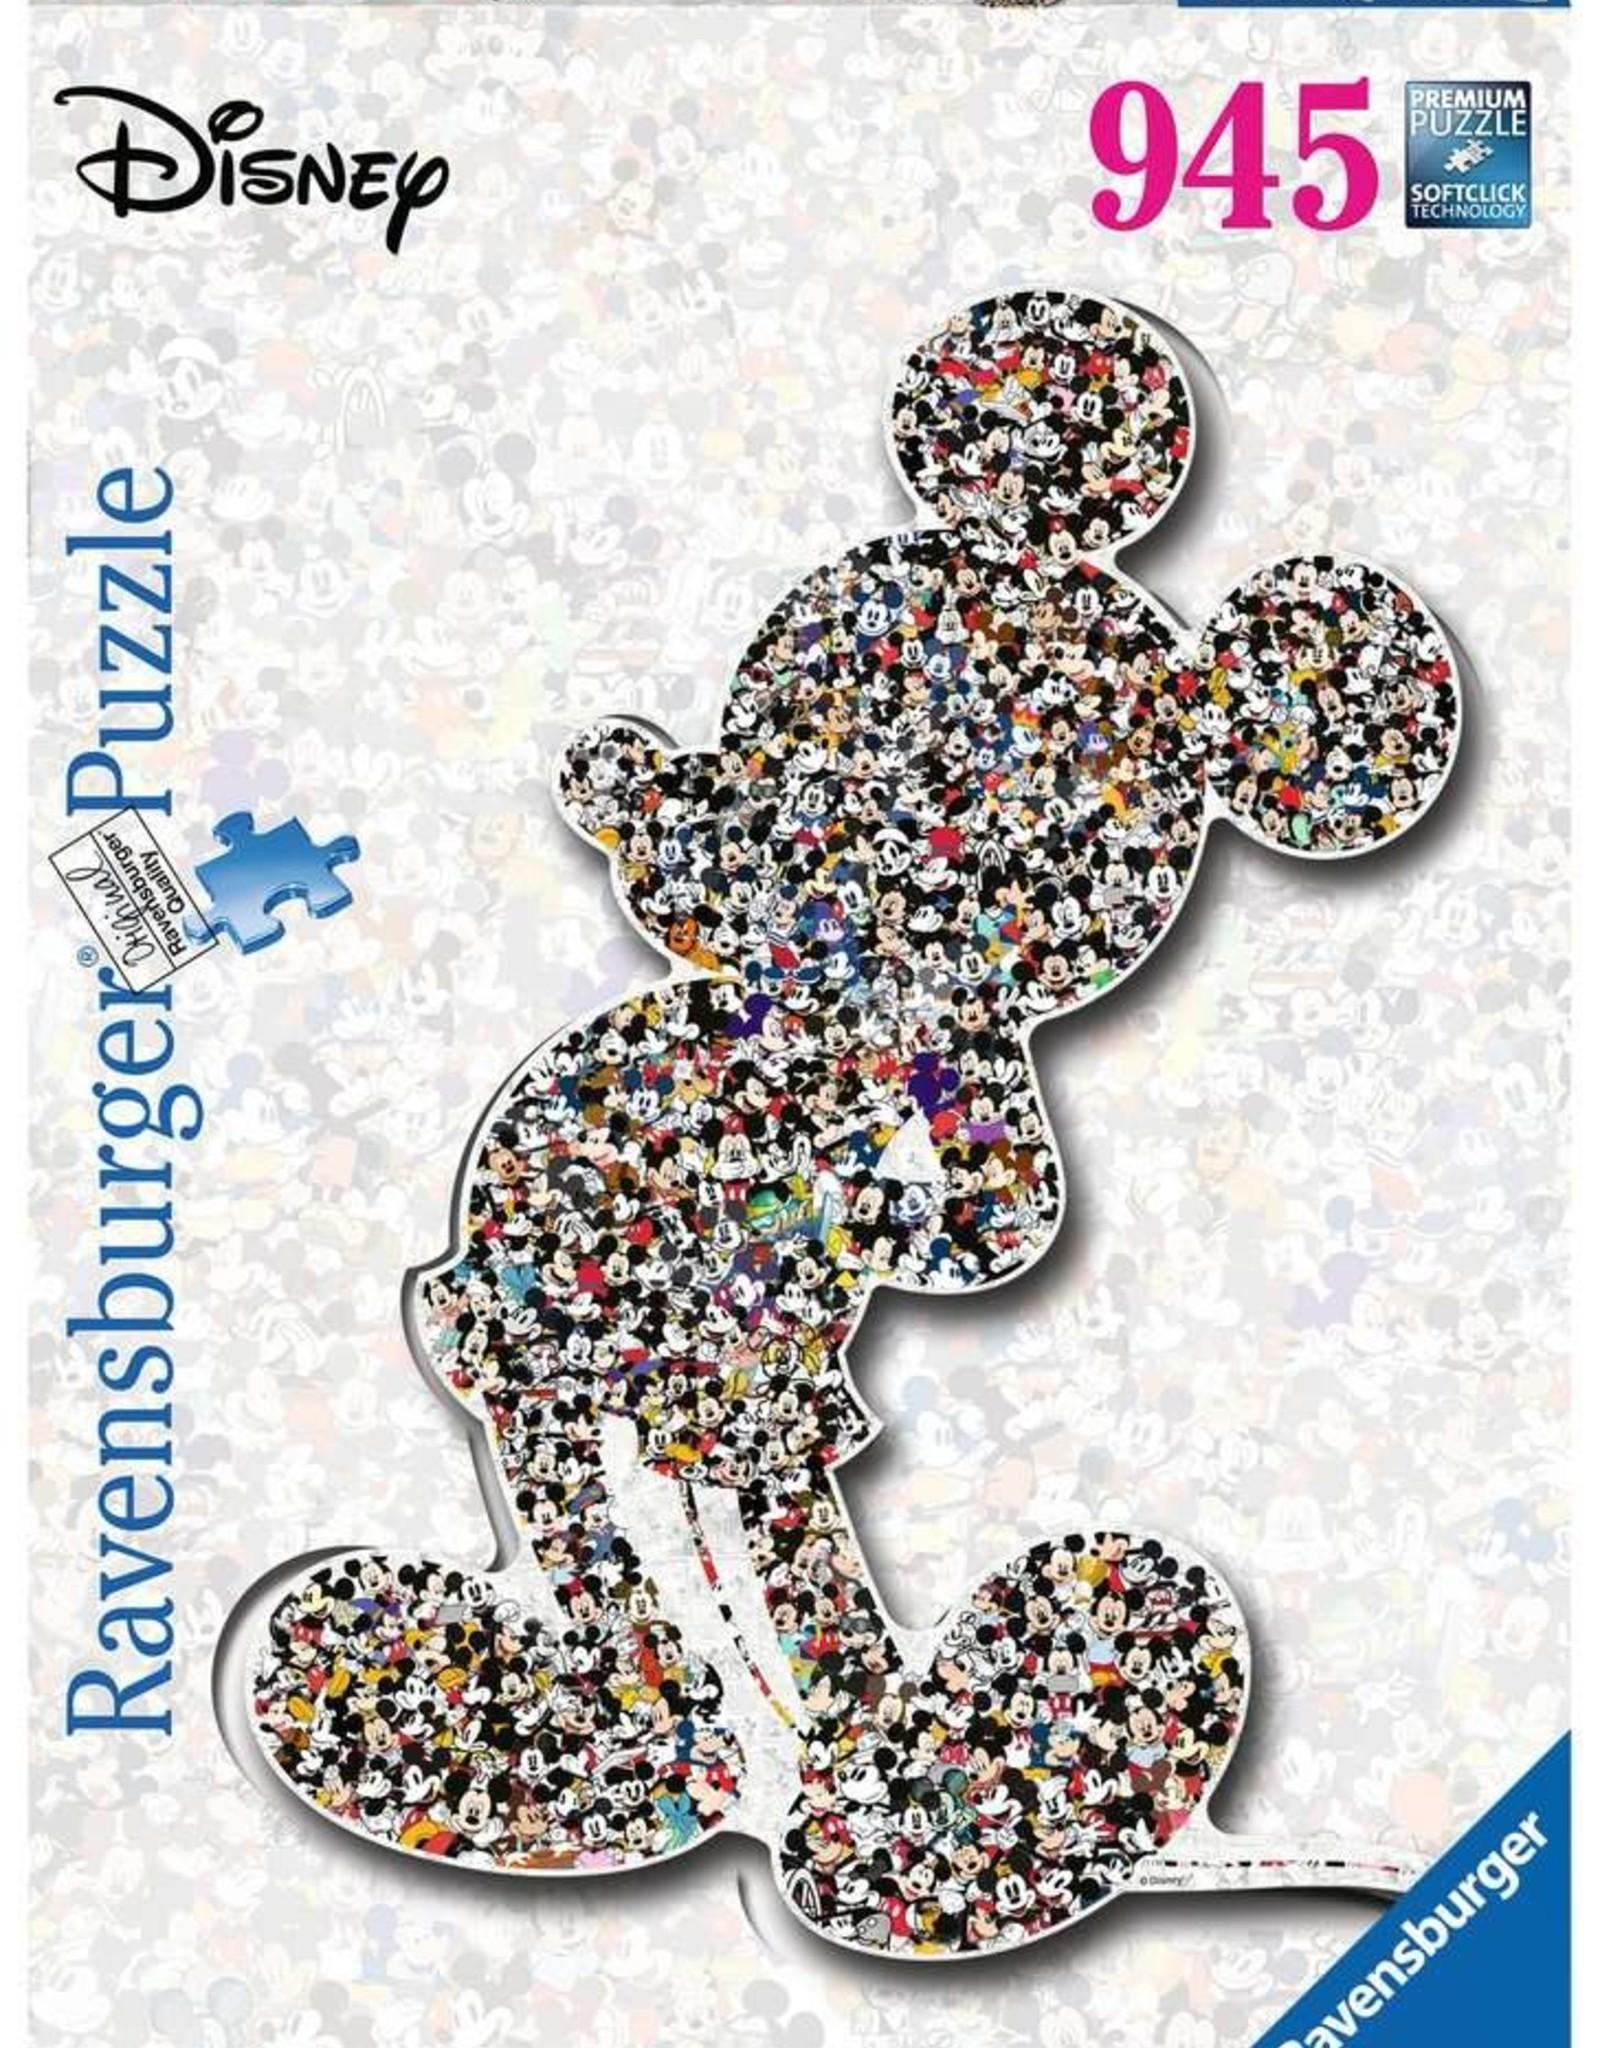 Ravensburger Shaped Mickey (945pc)